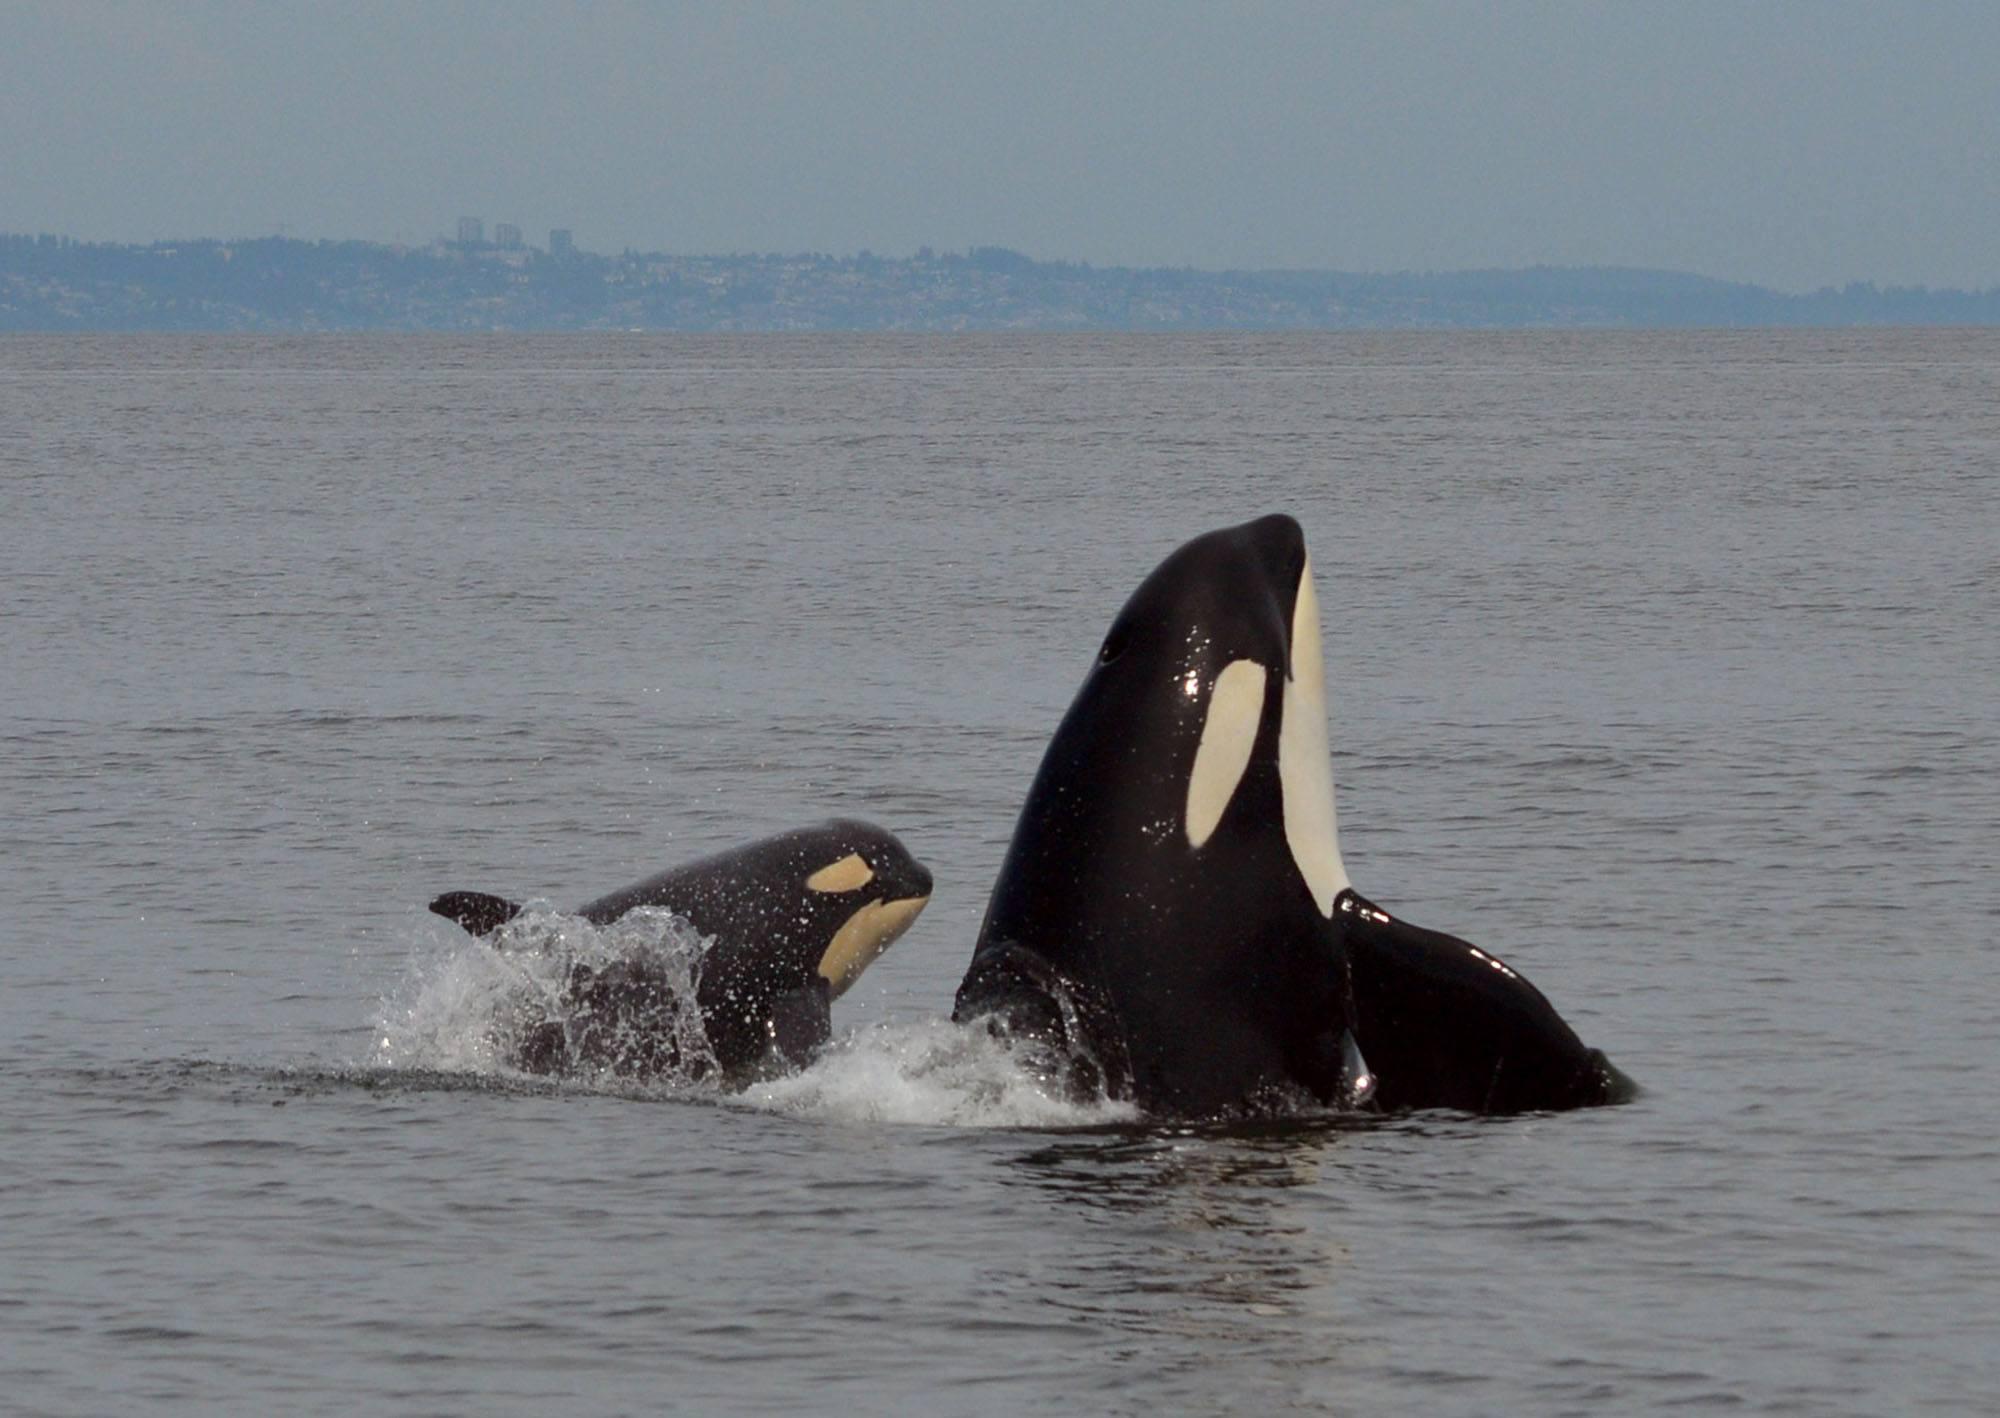 Orca calf Scarlett (J50) with Slick (J16). Photo by Naturalist Tasli Shaw, Steveston Seabreeze Adventures, Richmond, BC.